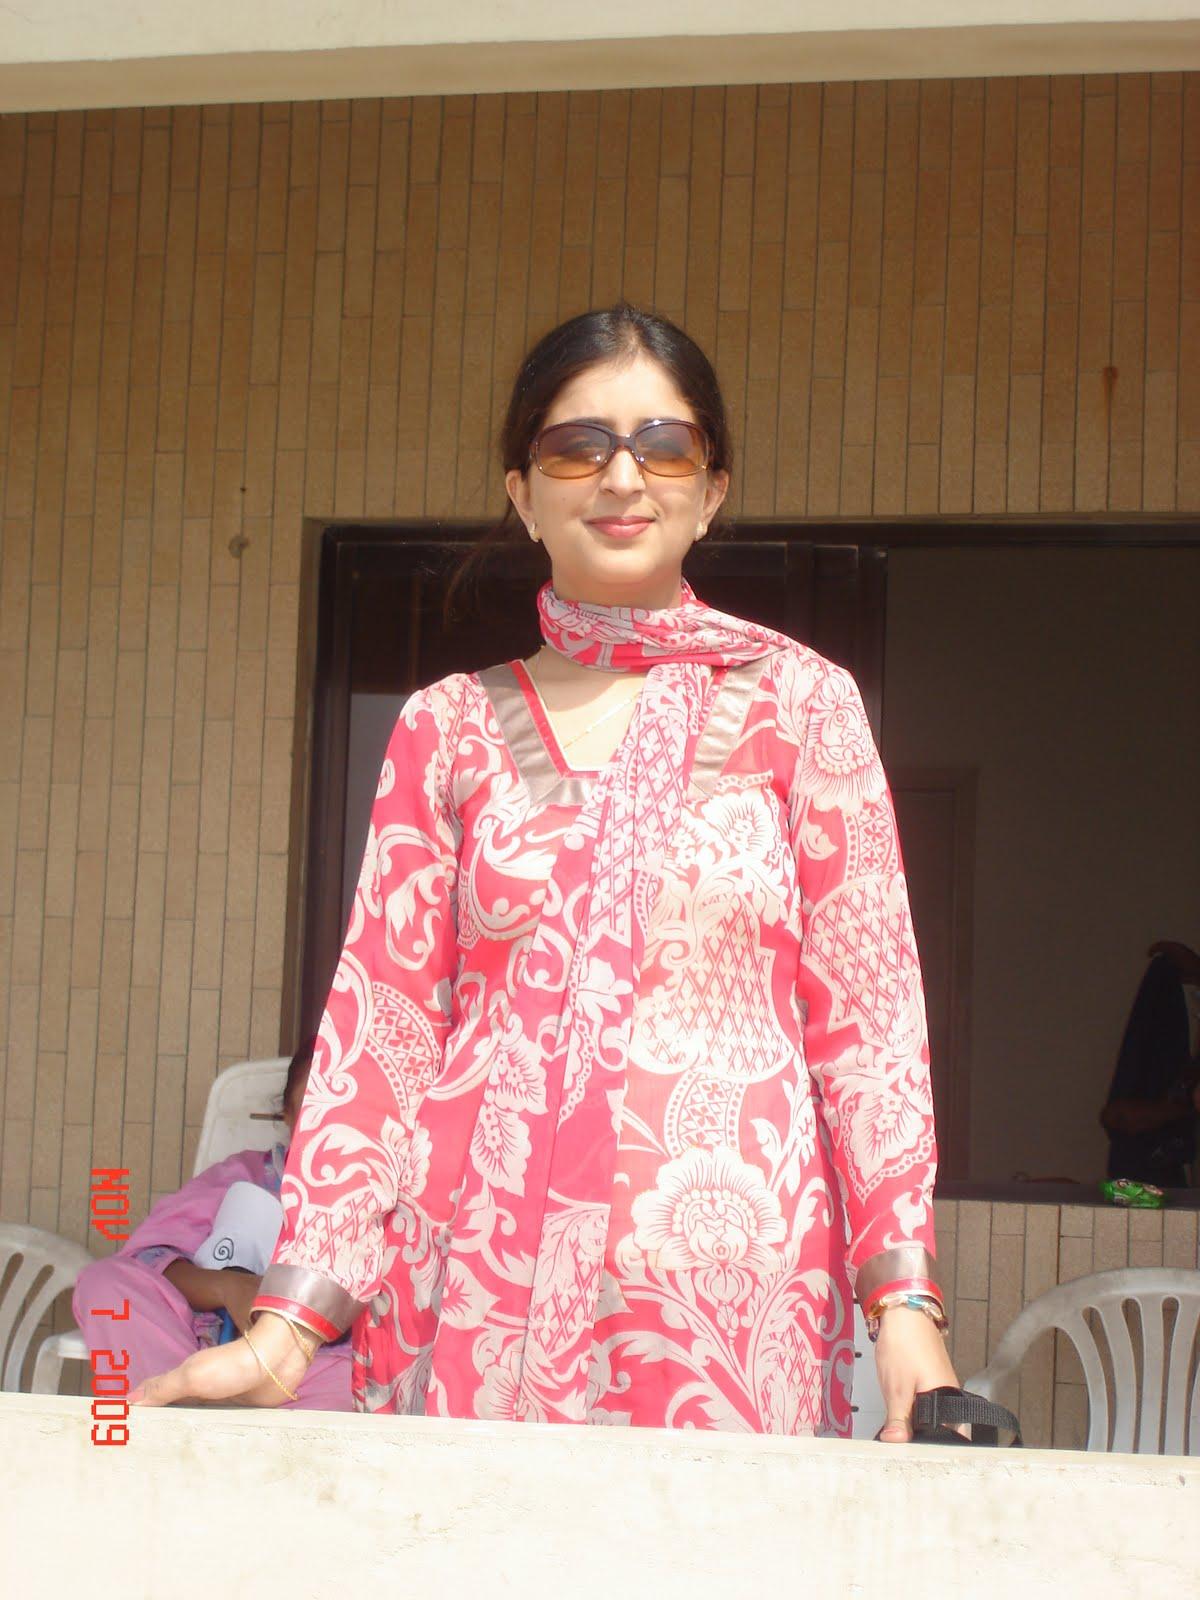 Middle east aisha aunty in kicthen